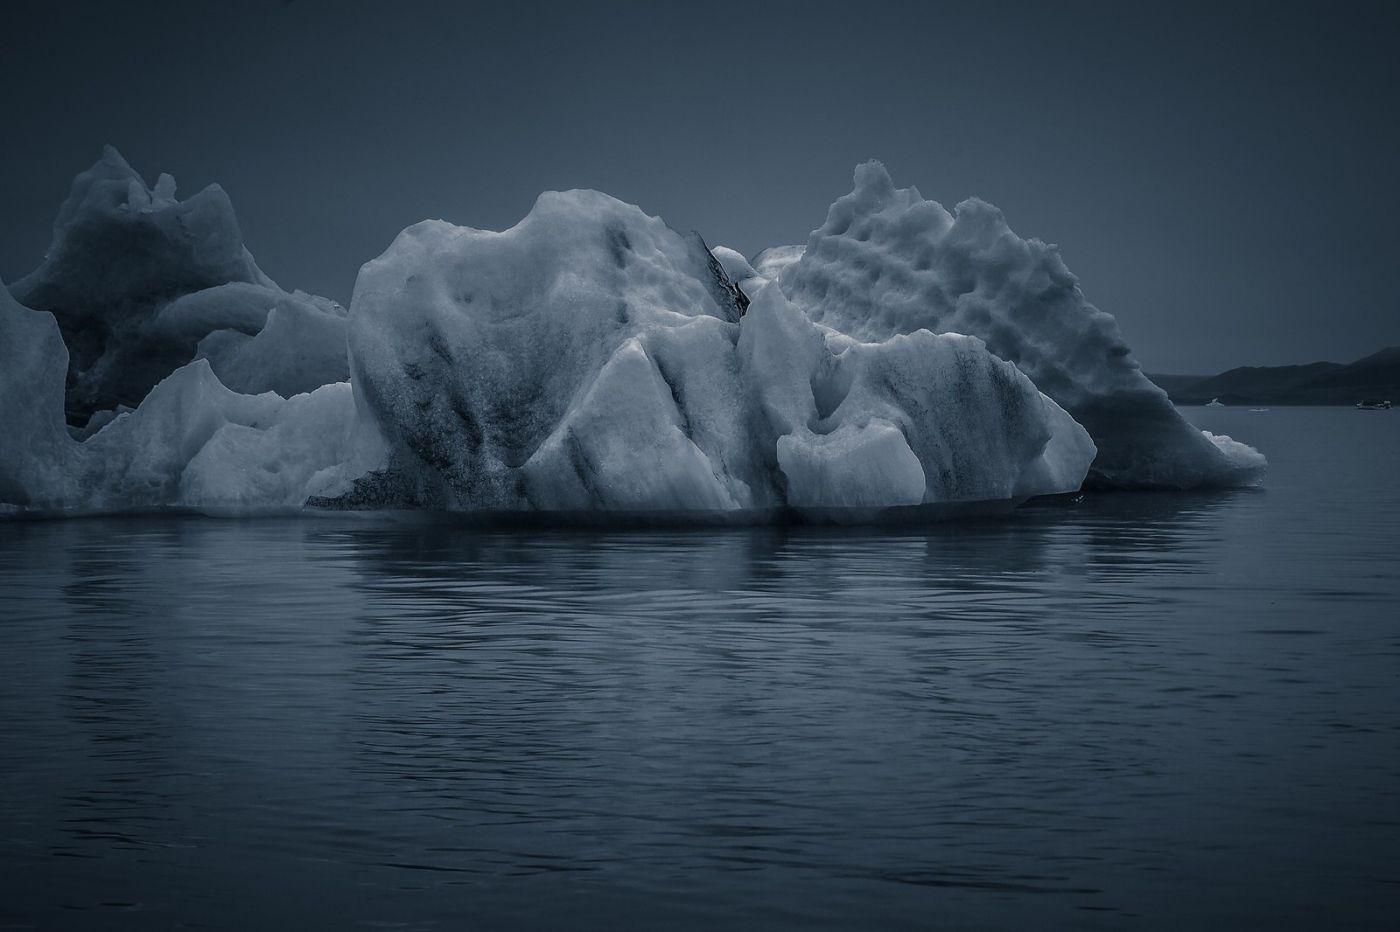 冰岛冰川泻湖(Glacier Lagoon),流动的冰川_图1-1